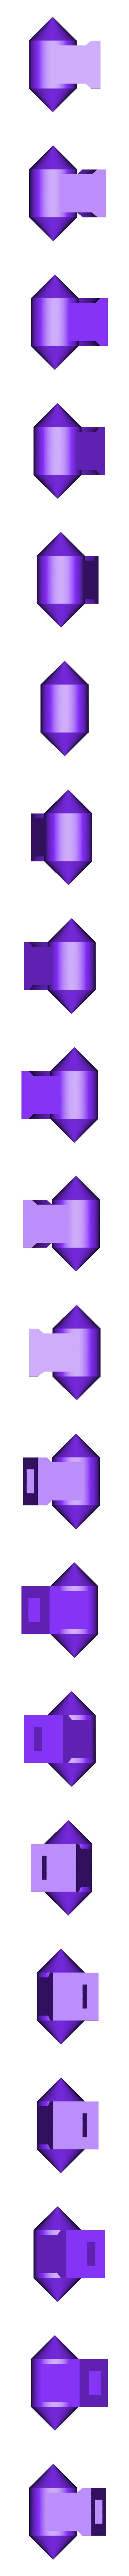 end2.stl Download free STL file HeavyDuty Flexible KeyFob and Bracelet • 3D print object, hitchabout